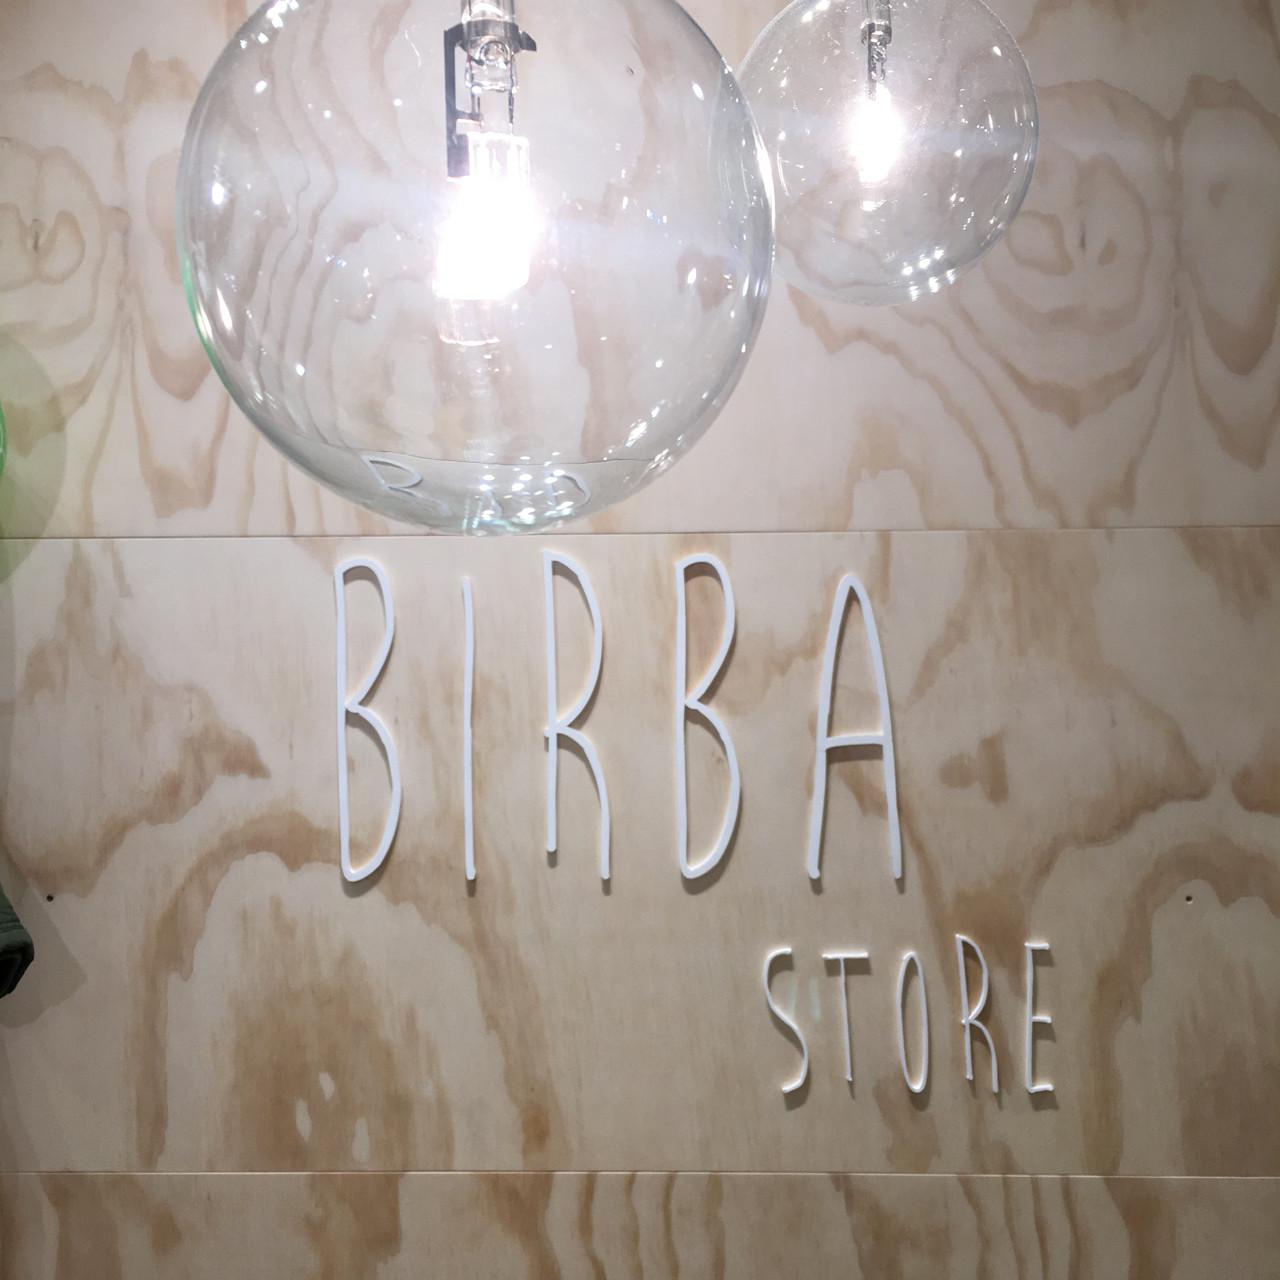 birba store santarcangelo